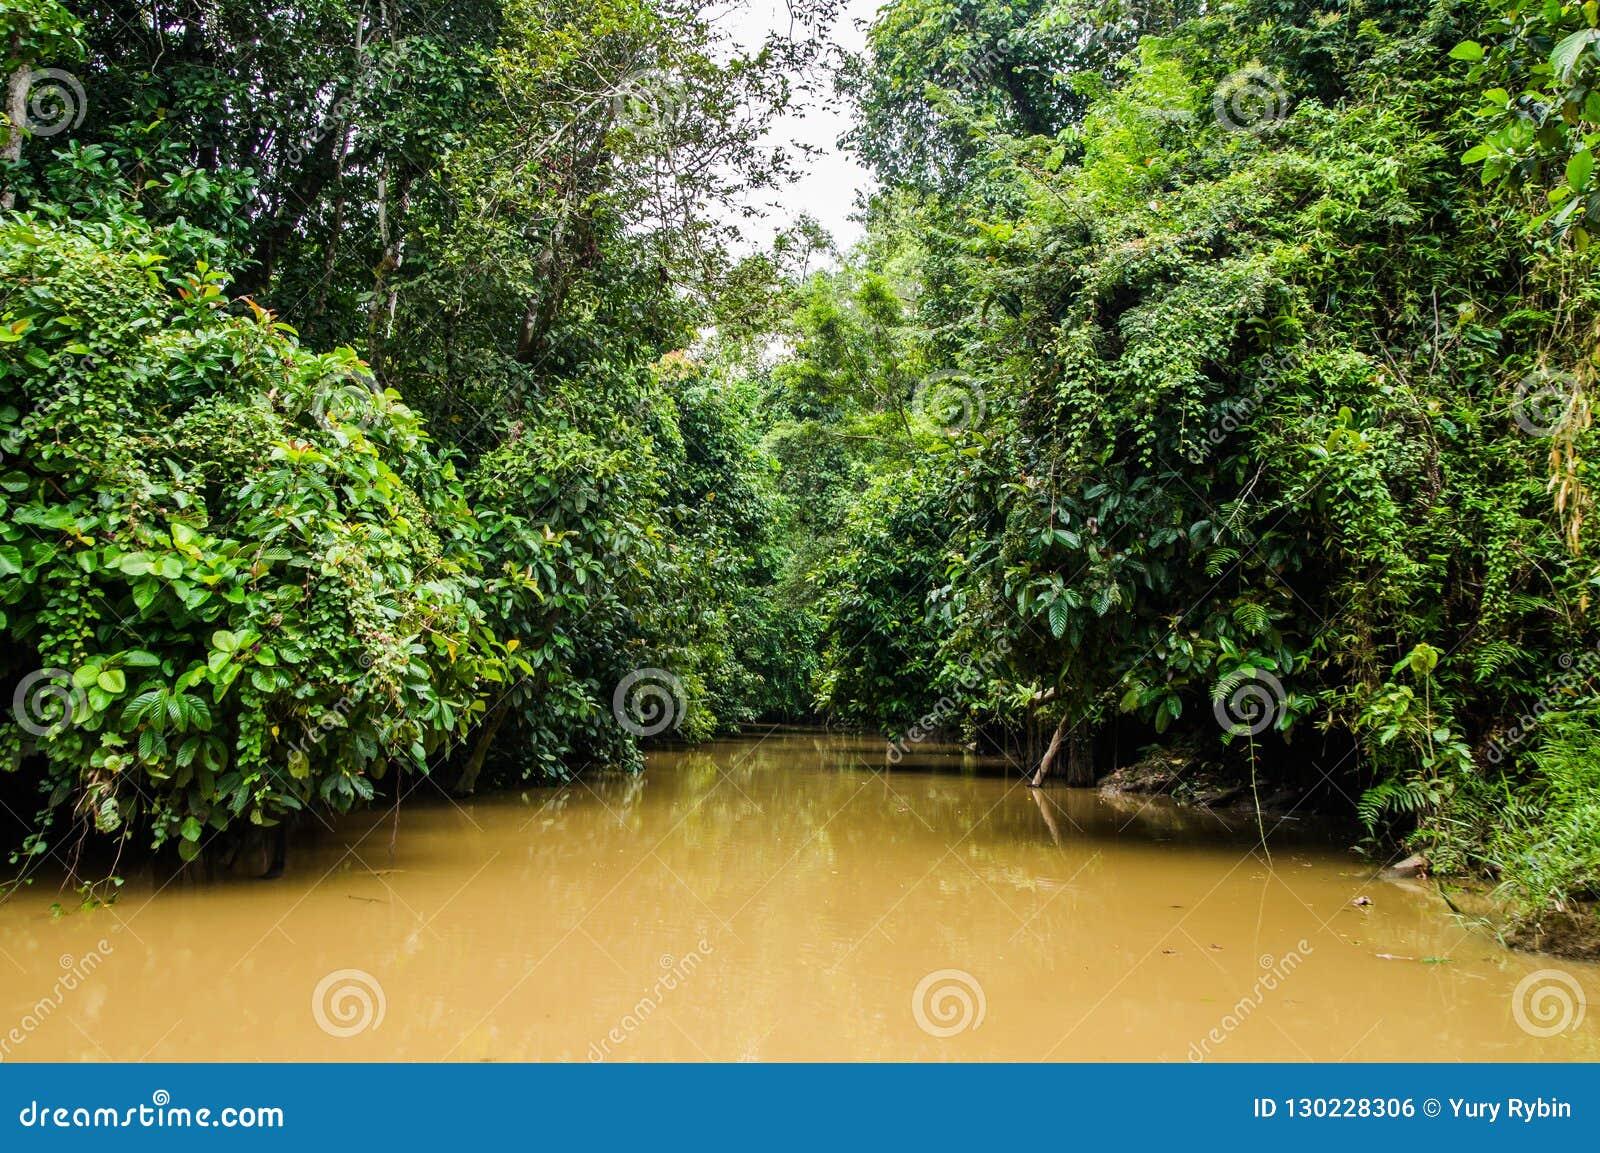 Selva tropical a lo largo del río kinabatangan, Sabah, Borneo Malaysi